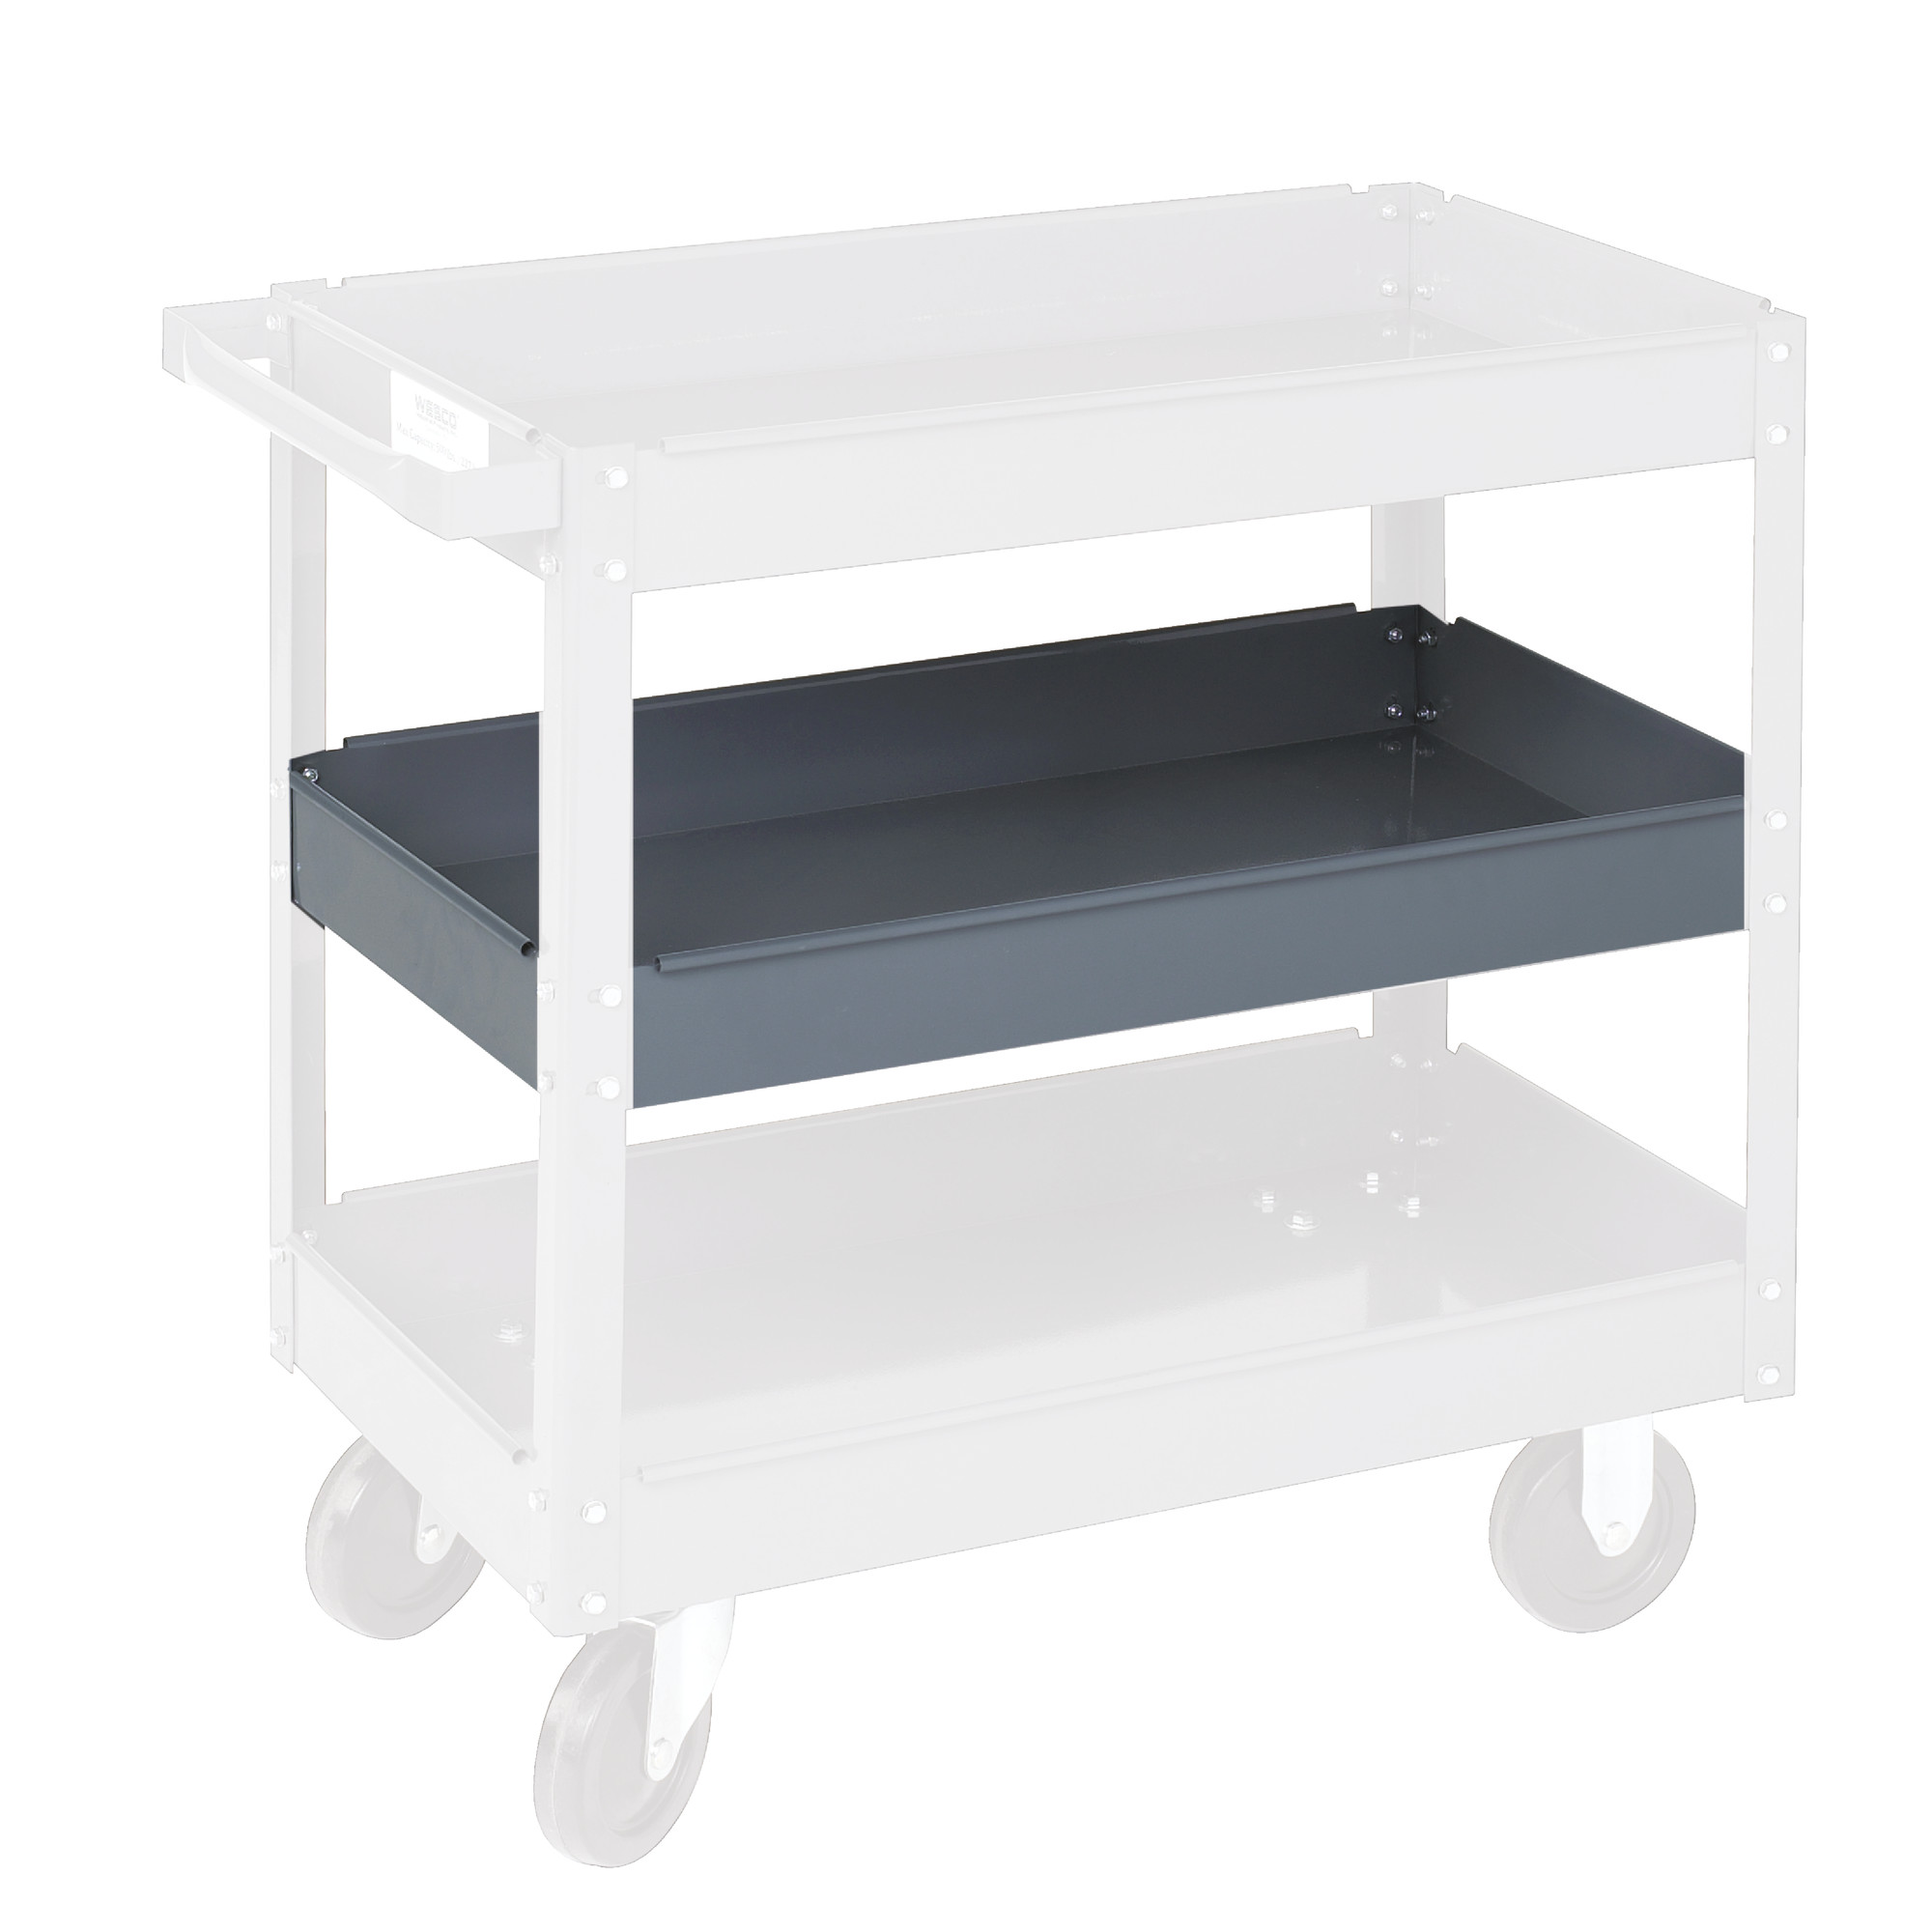 Optional Middle Shelf for Steel Service Cart